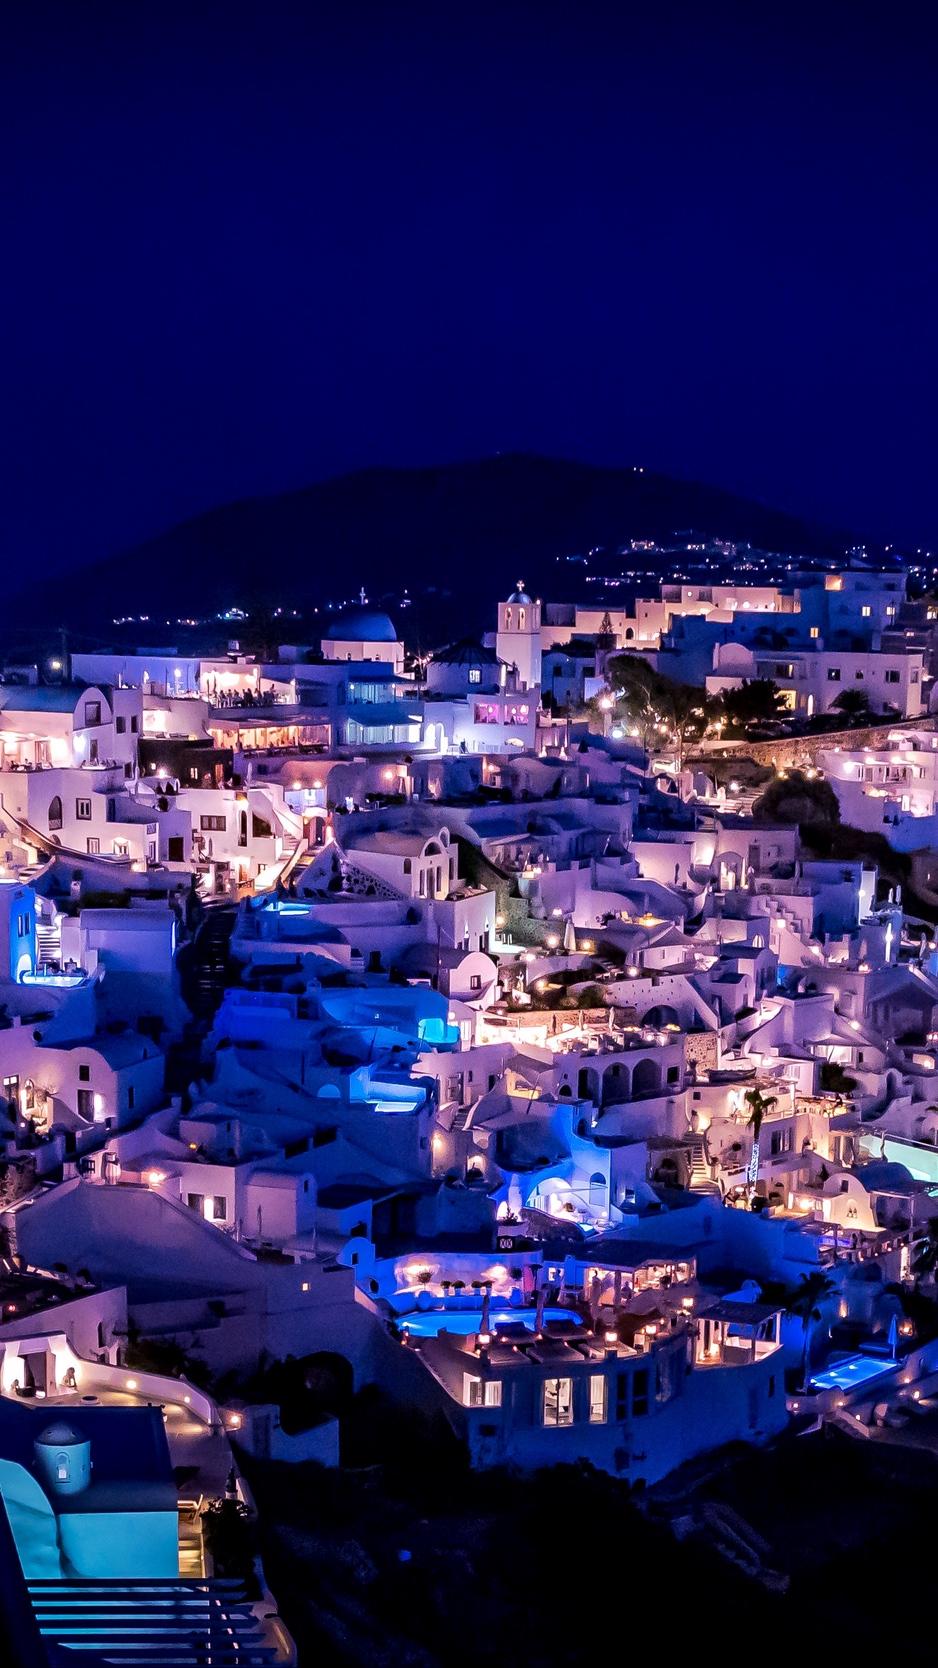 Download wallpaper 938x1668 santorini greece night city 938x1668